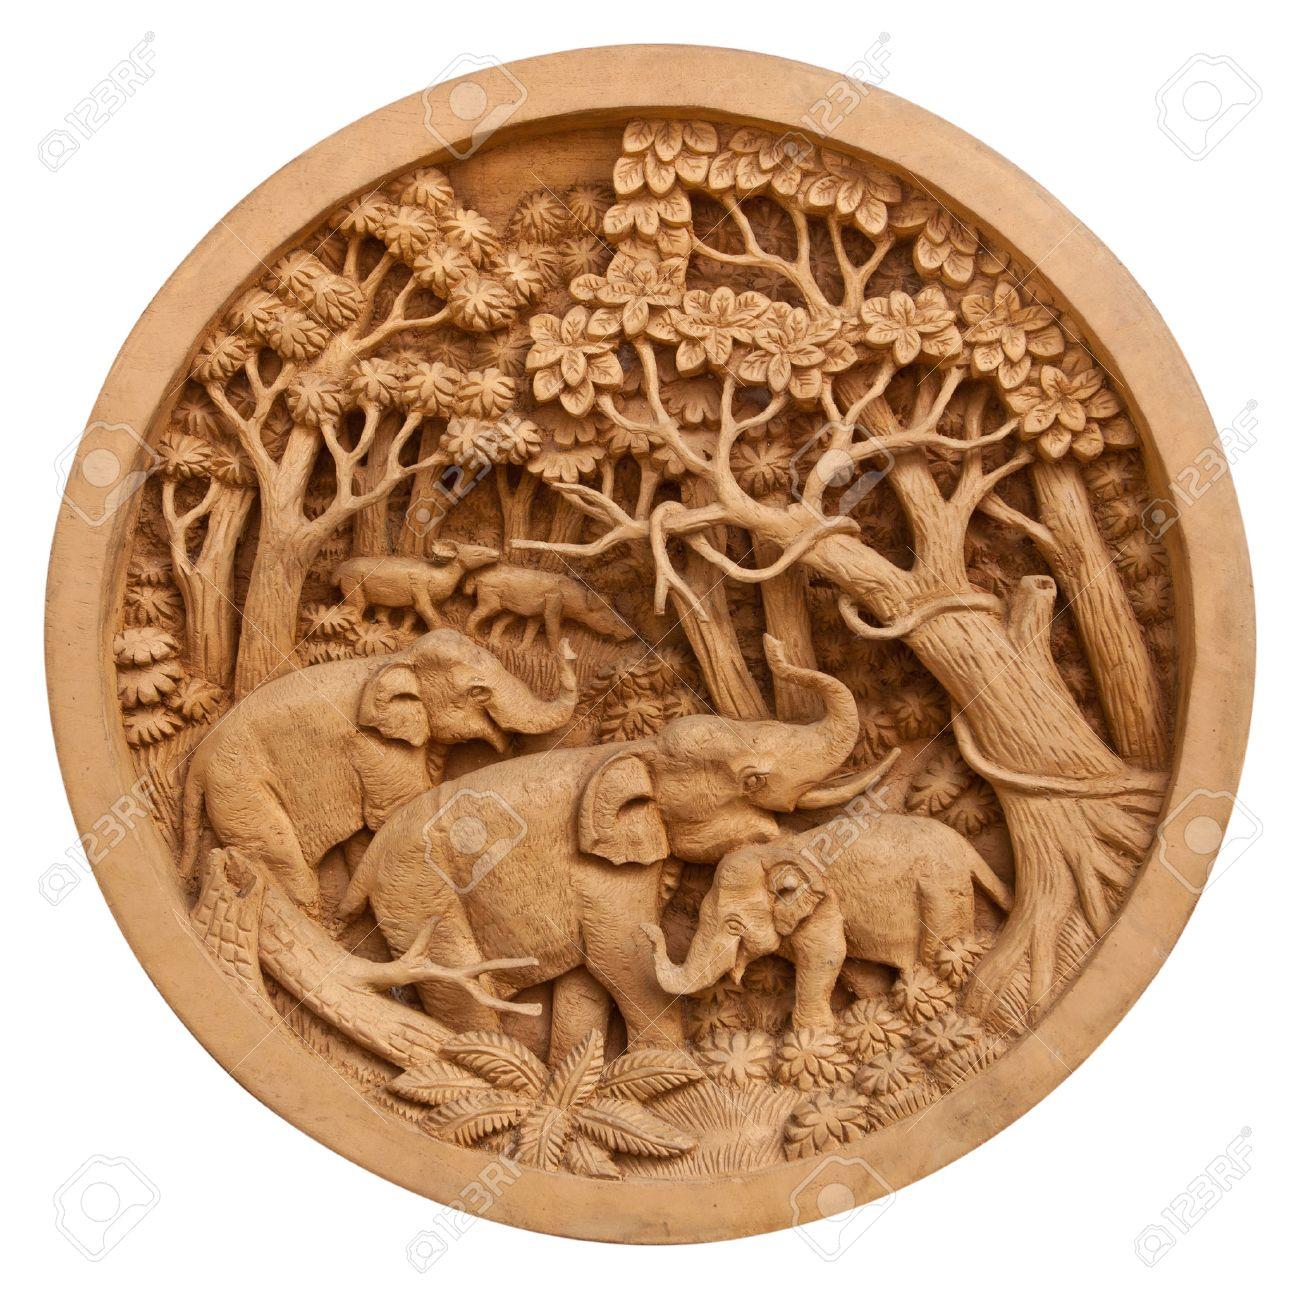 Carved Thai elephant on the circle wood frame - 24871009